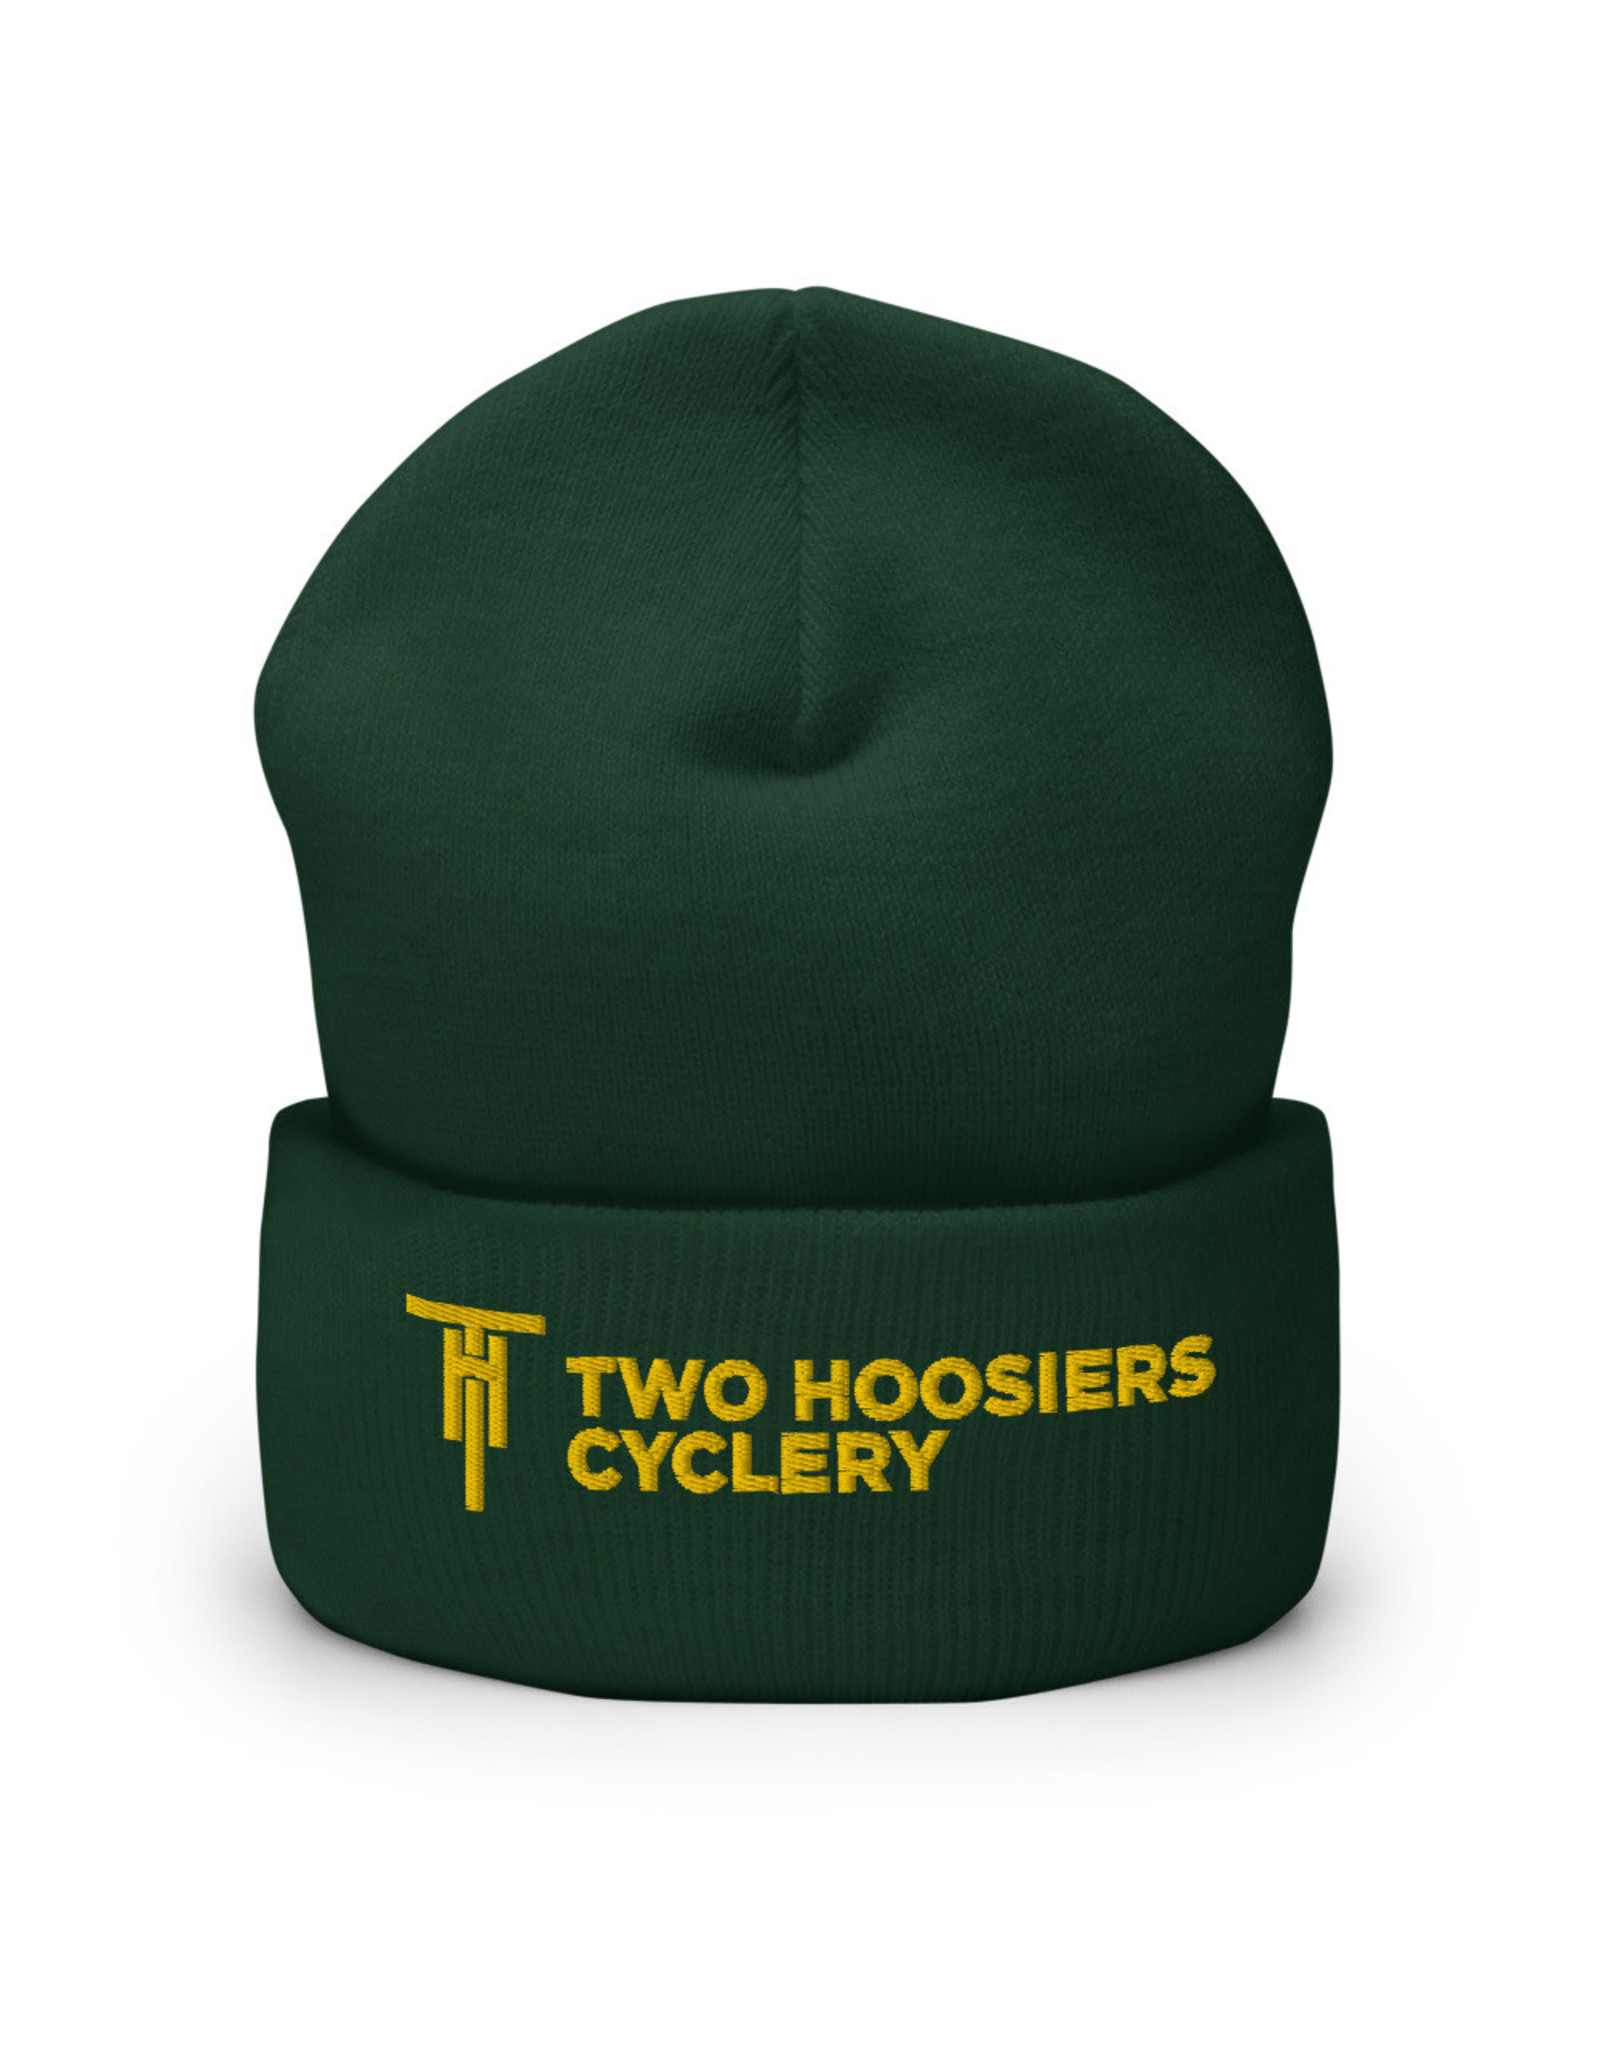 Two Hoosiers Cyclery 2021 Two Hoosiers Cyclery Cuffed Beanie Spruce Green